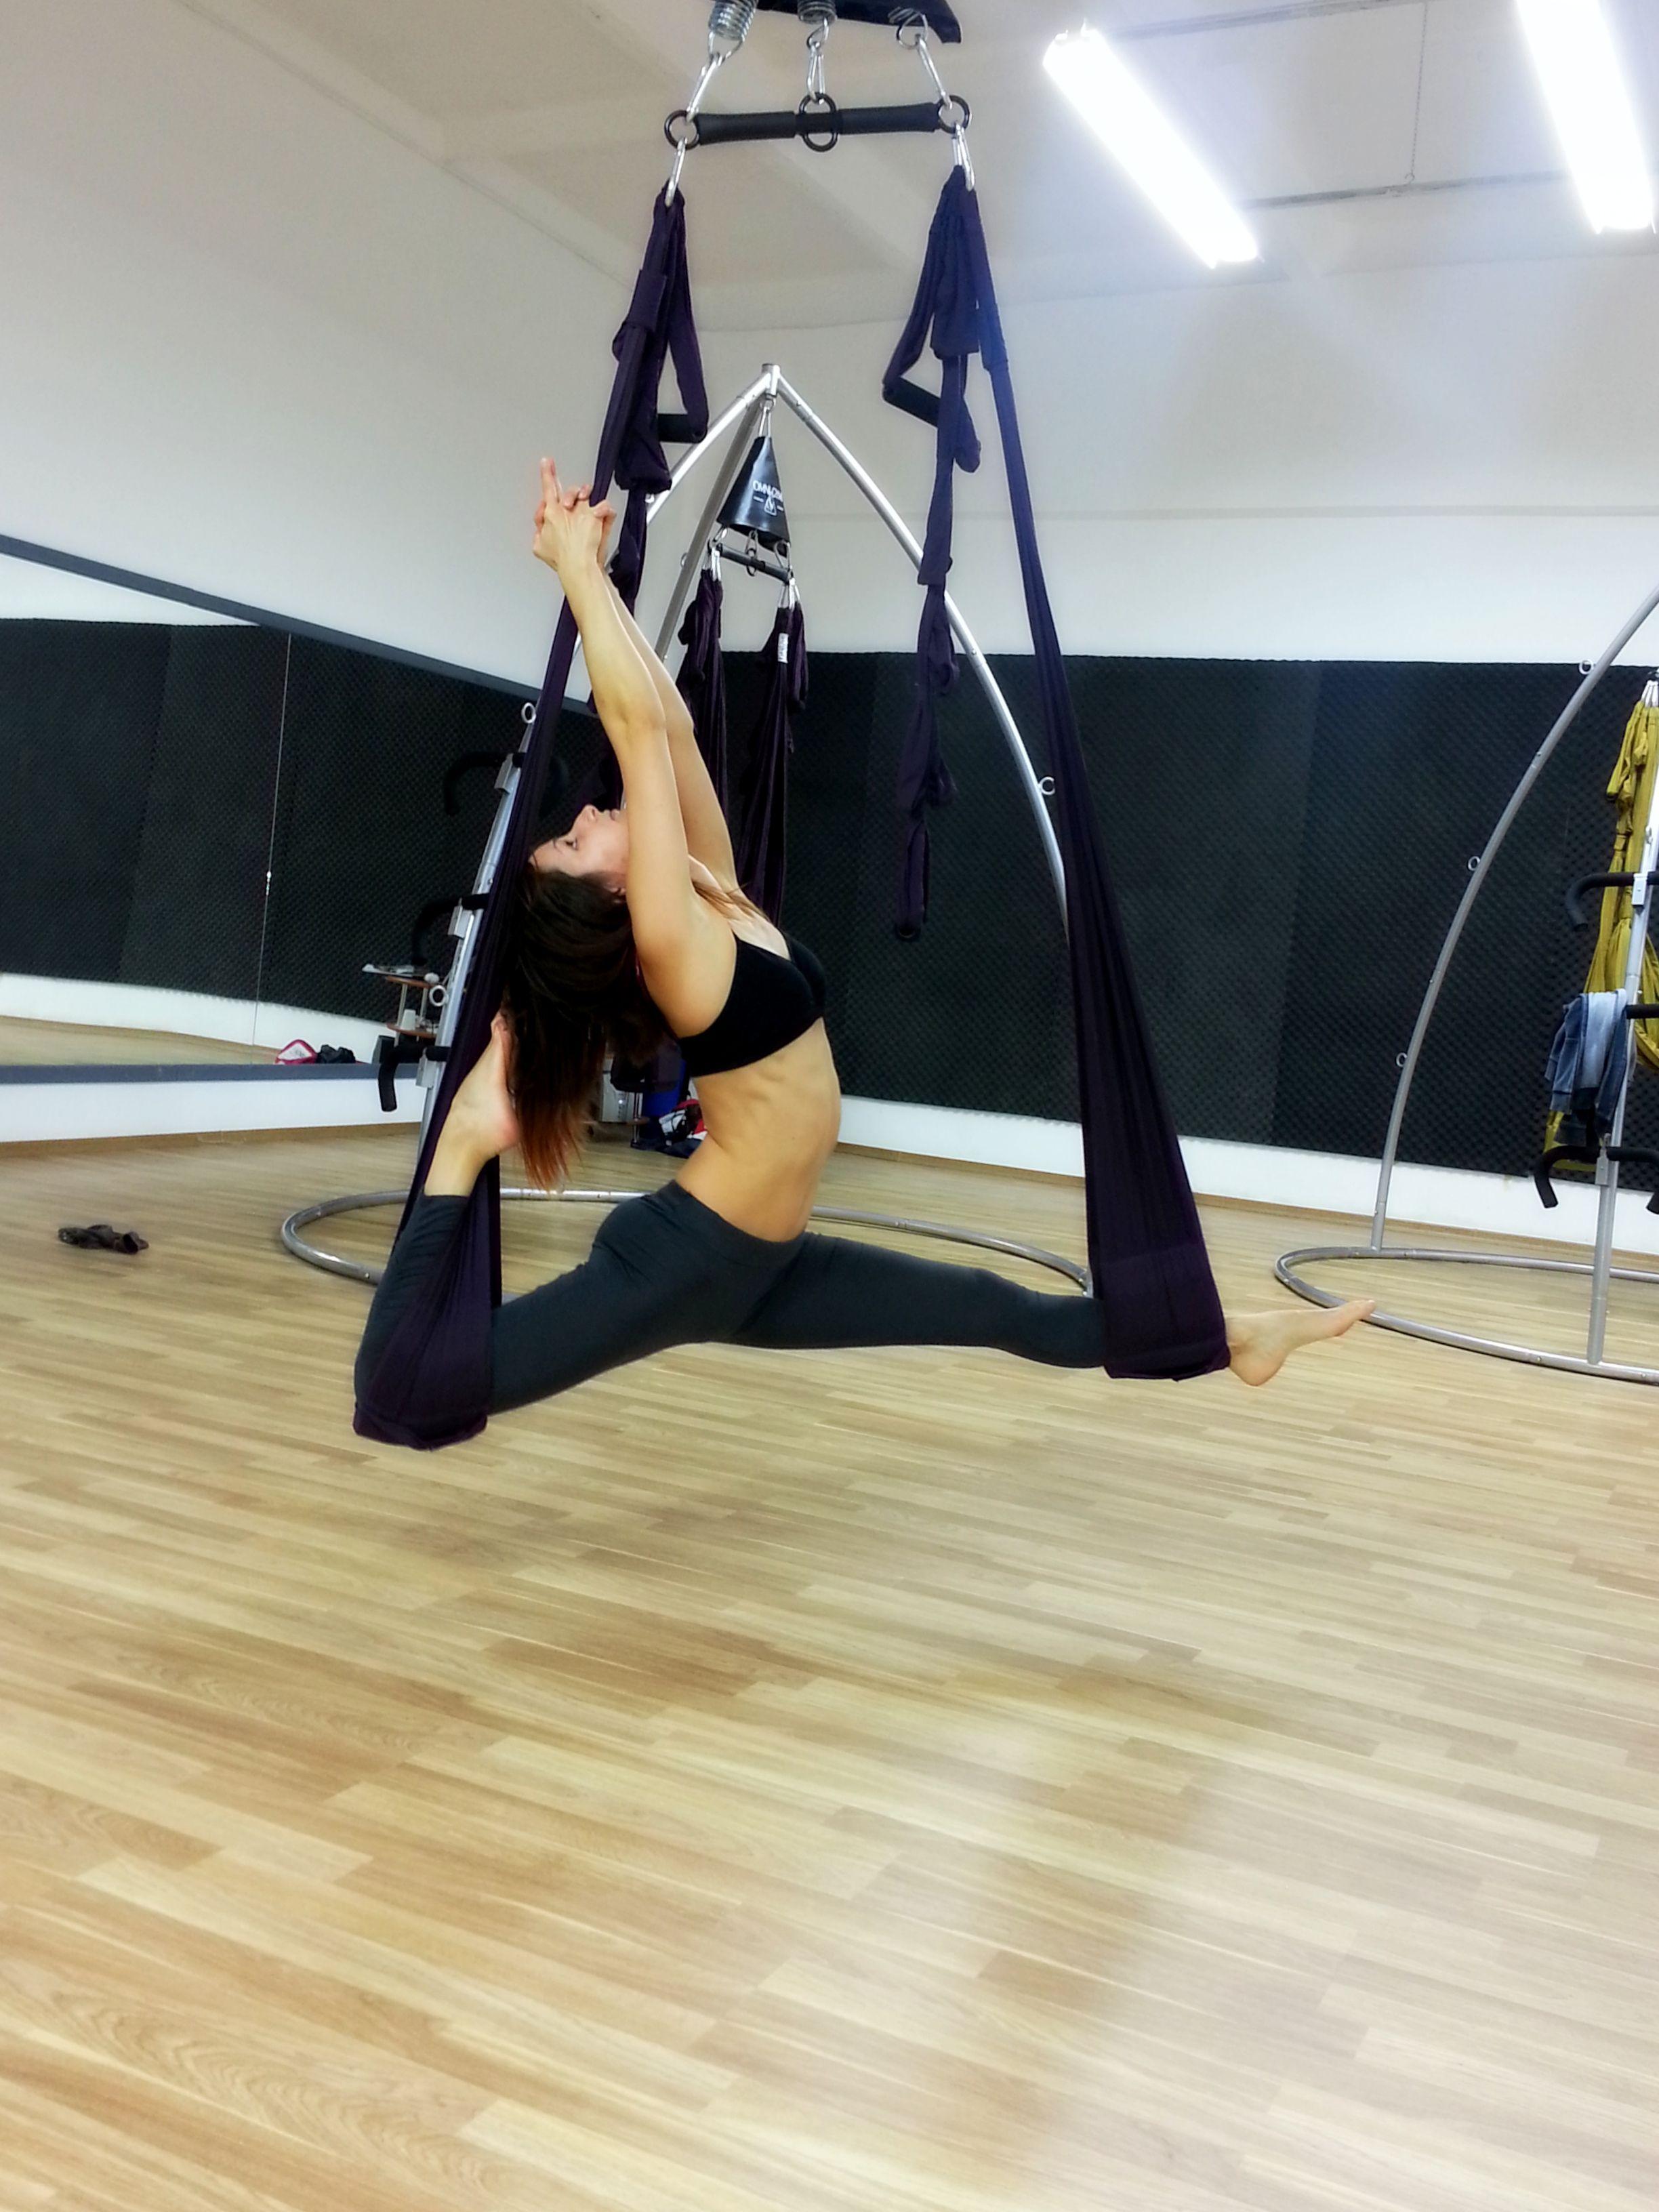 aerial yoga pose aerial yoga pose #omnigymstudio #oradea